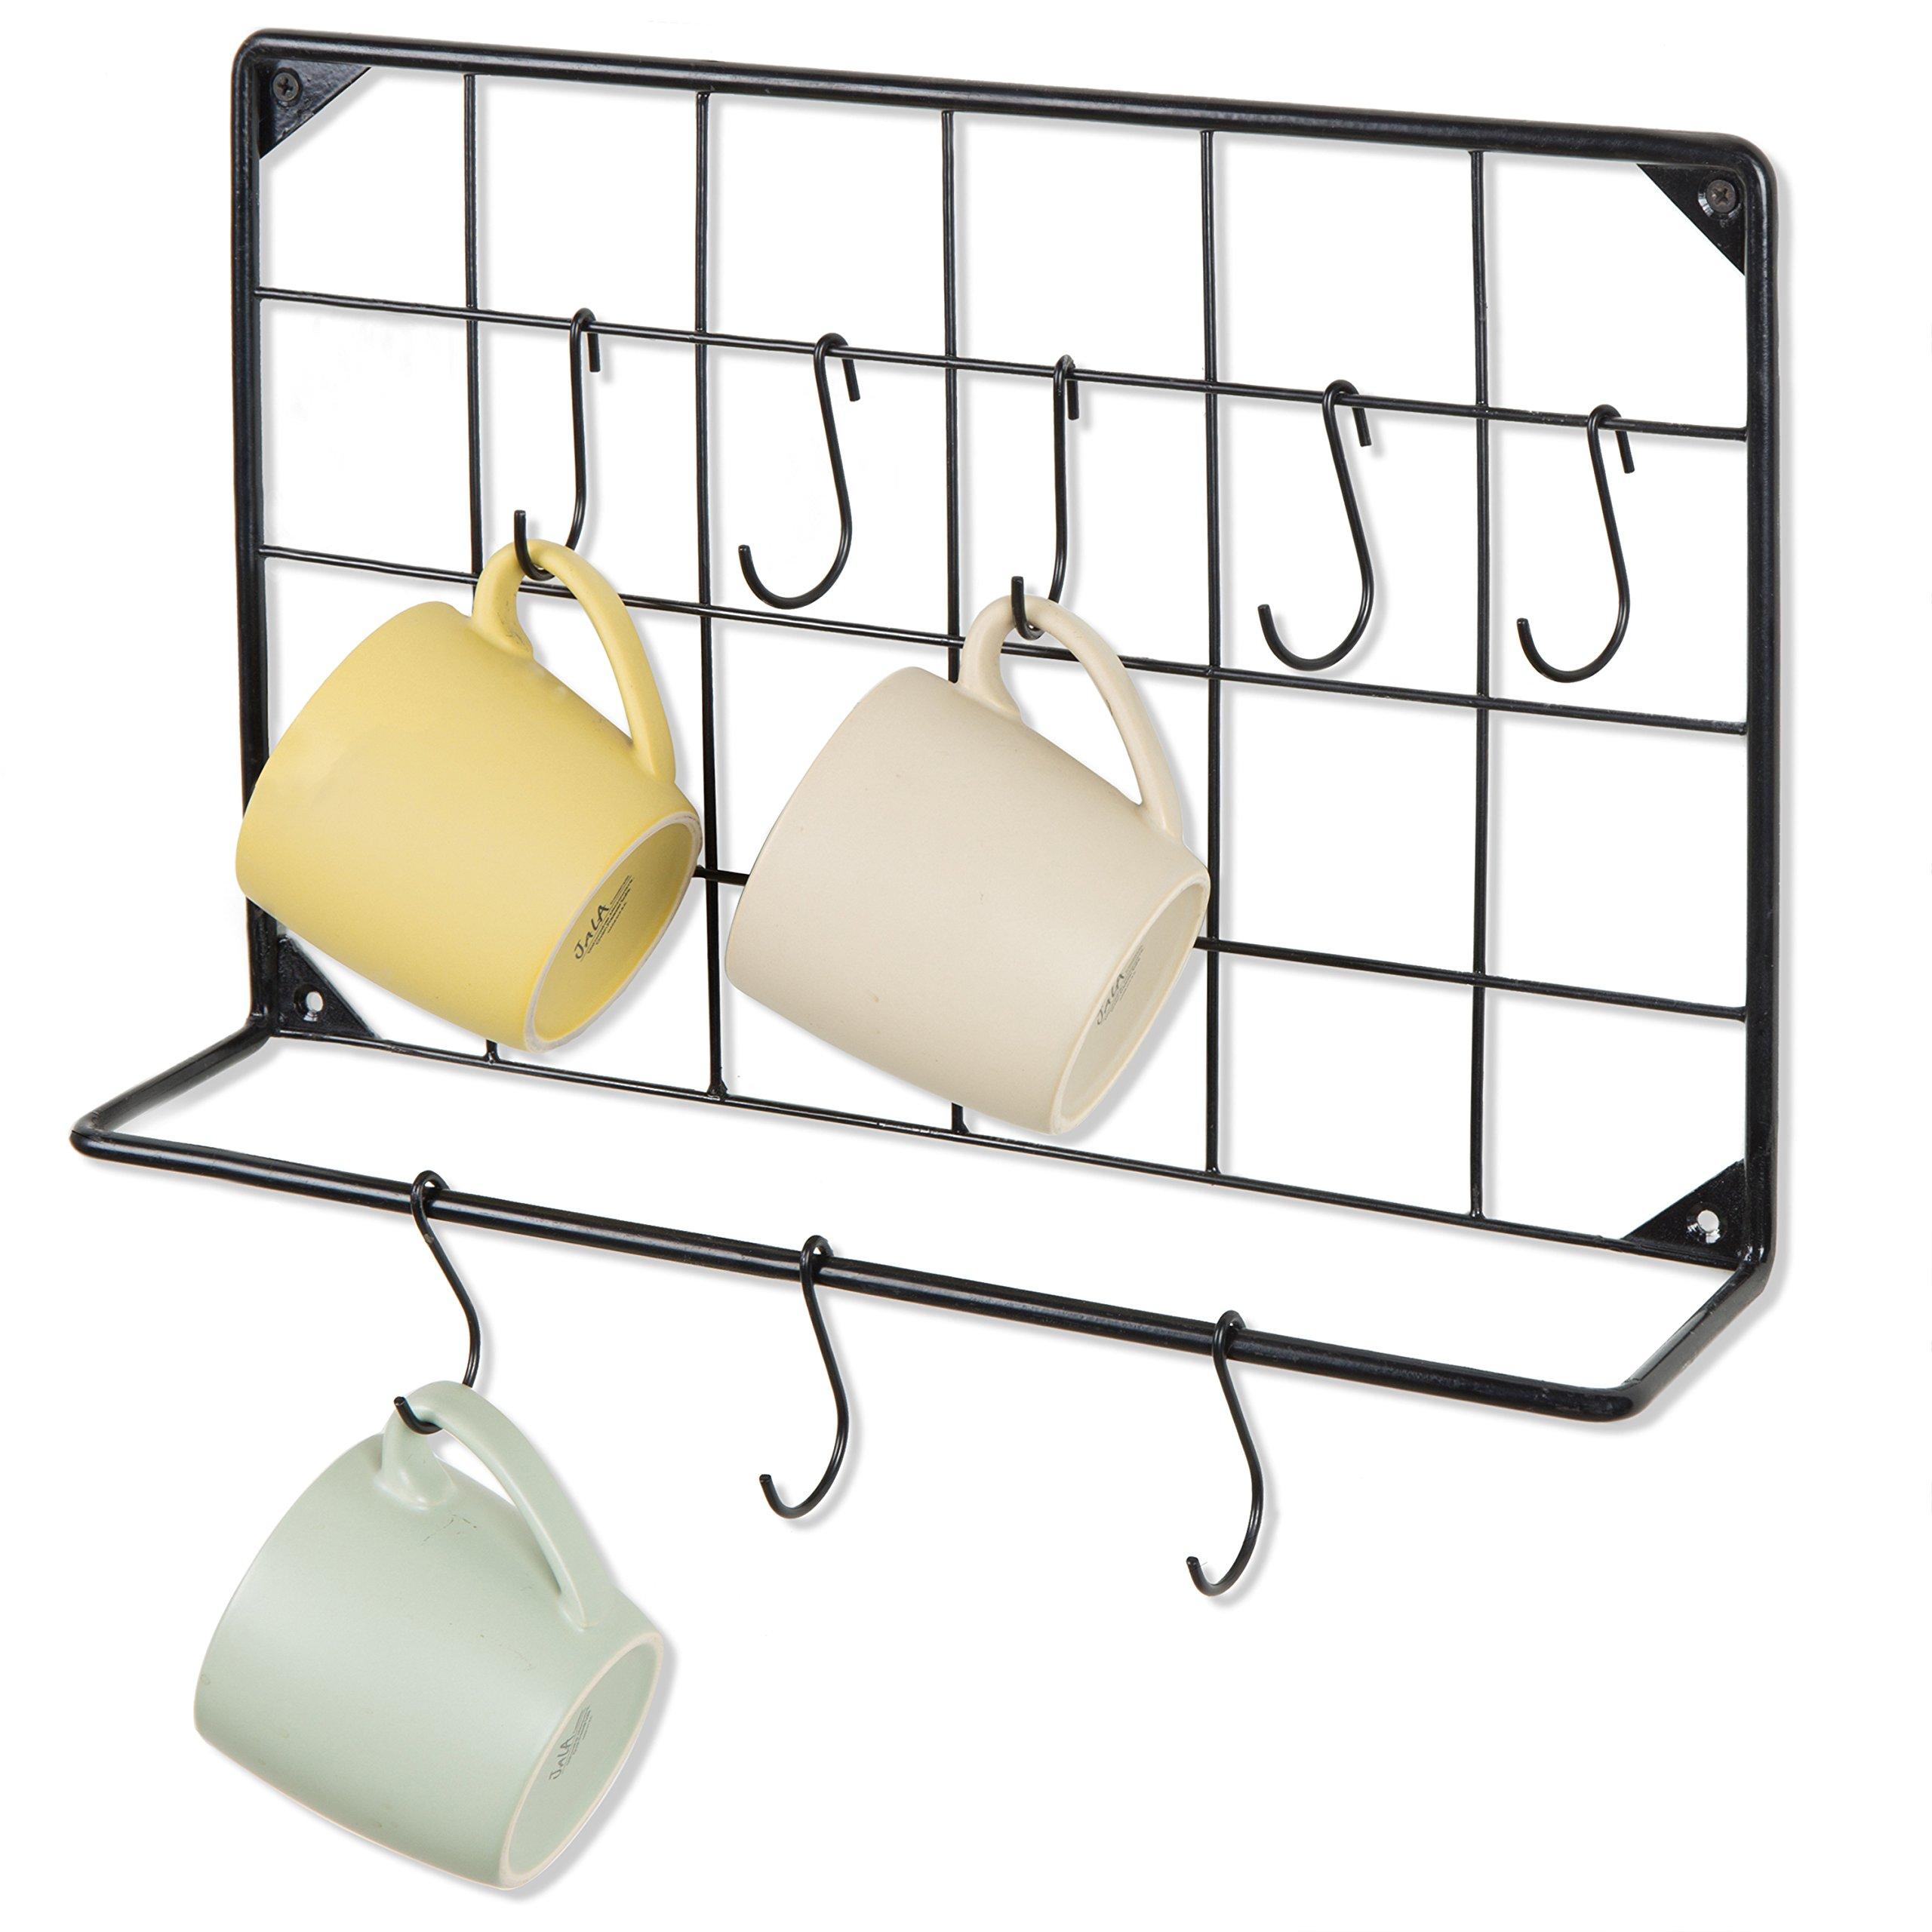 MyGift Wall-Mounted Coffee Mug & Utensil Hanging Rack with 8 S-Hooks